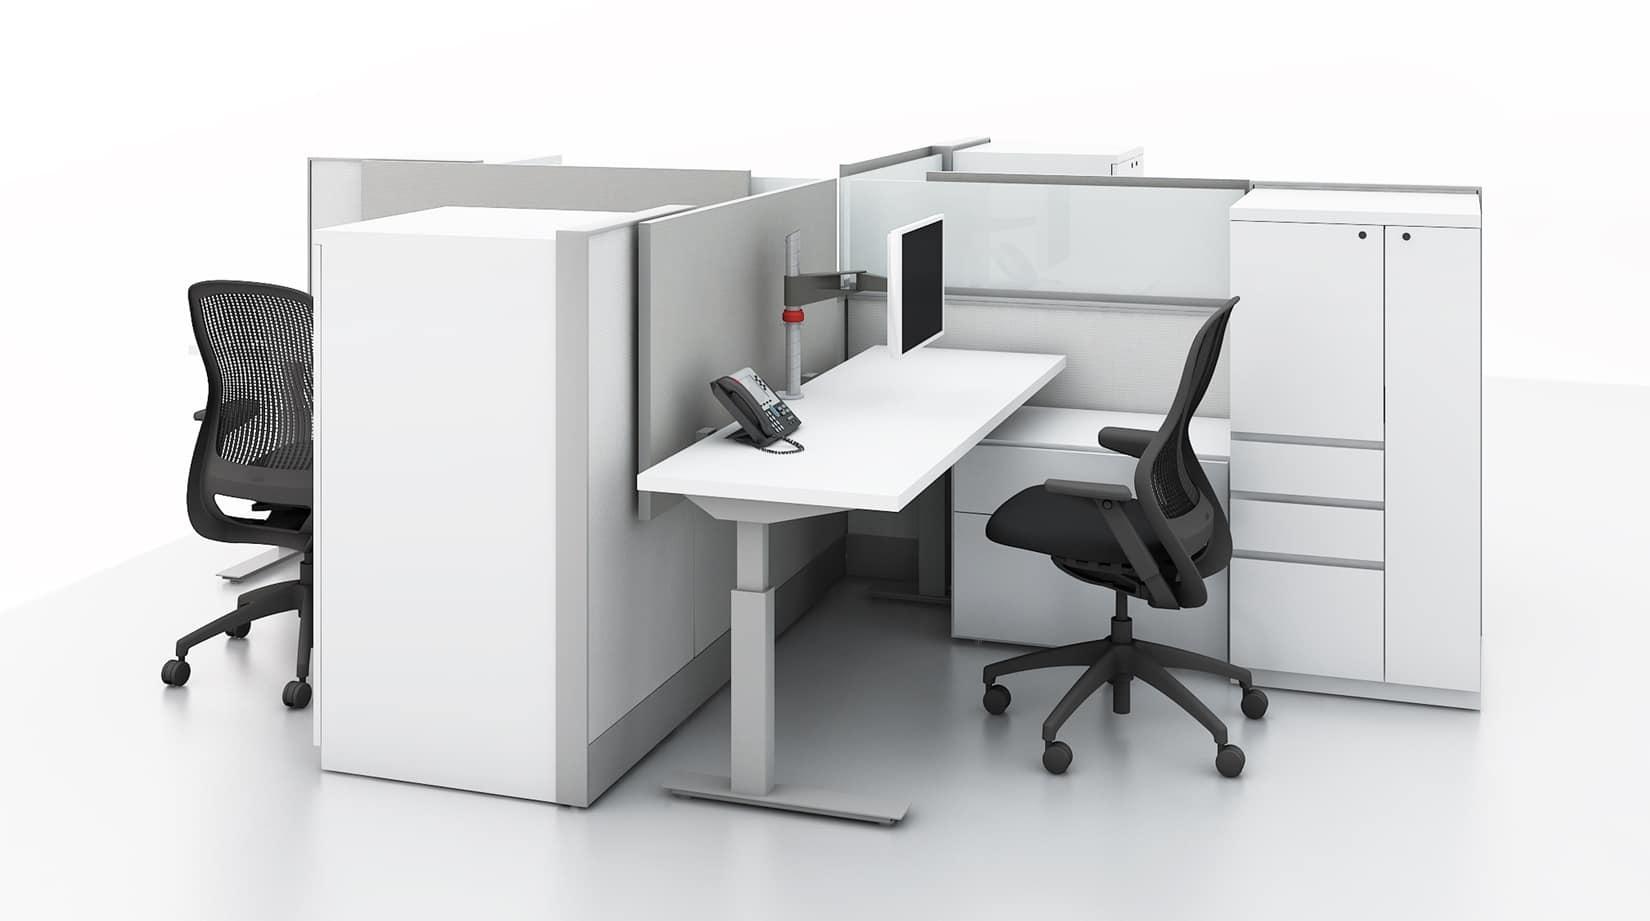 Powered height adjustable table